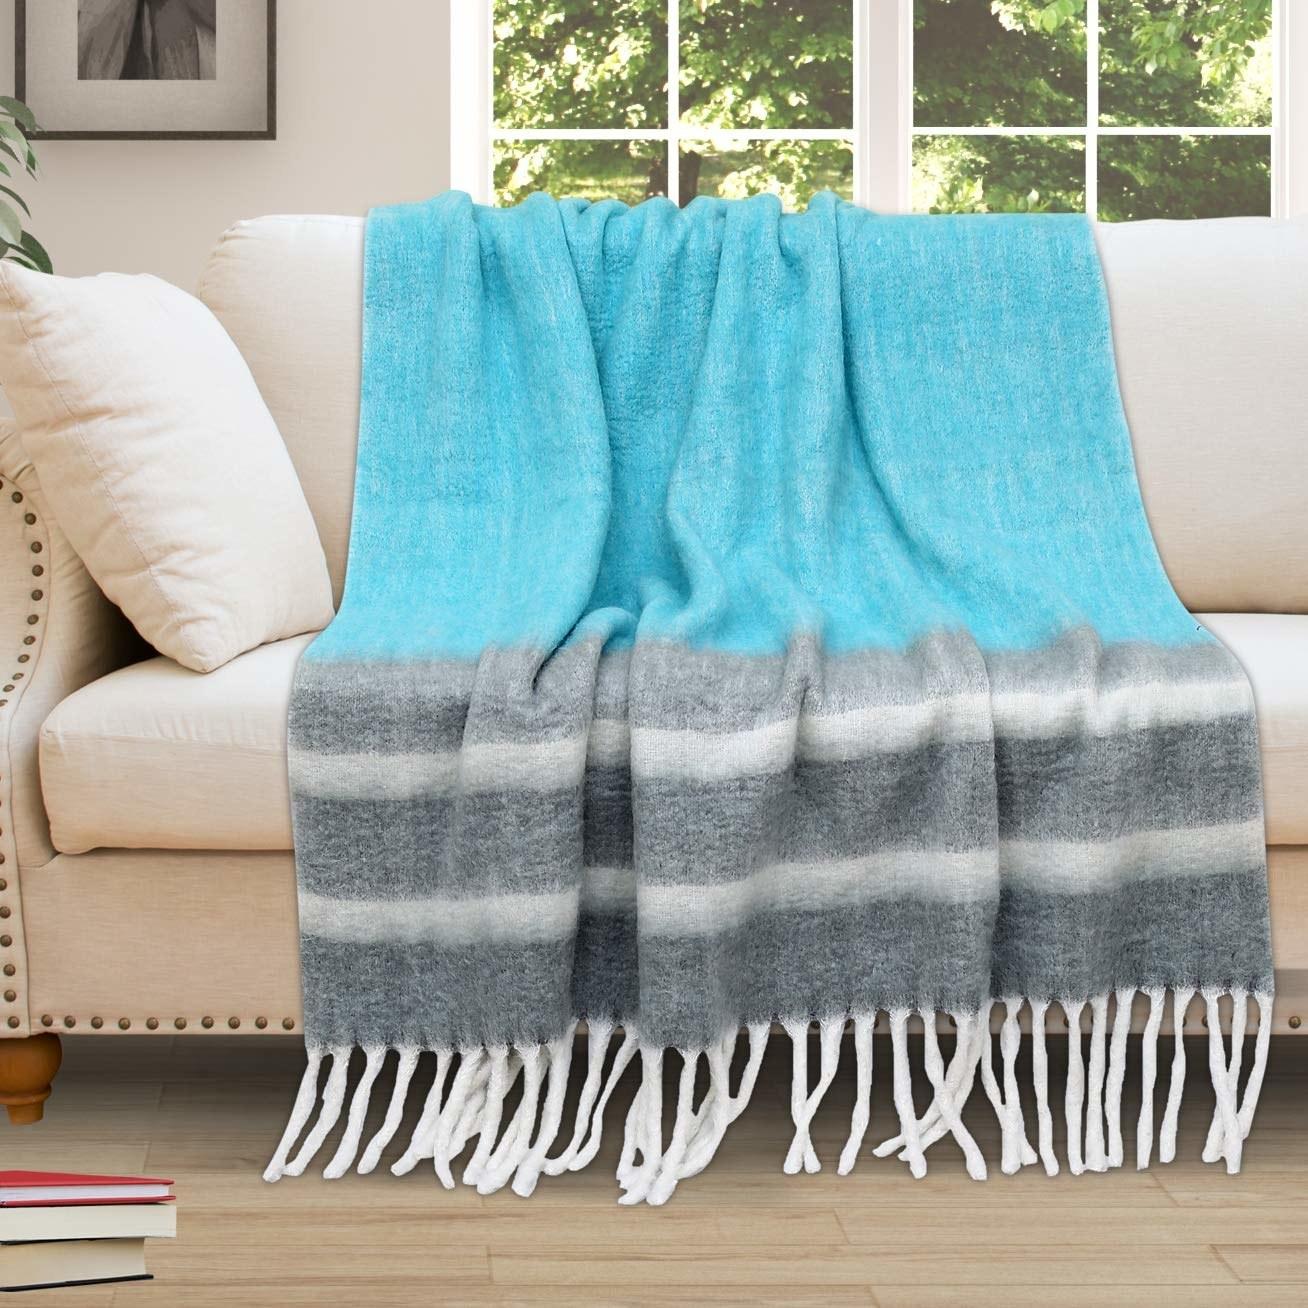 The throw blanket draped on a beige sofa.